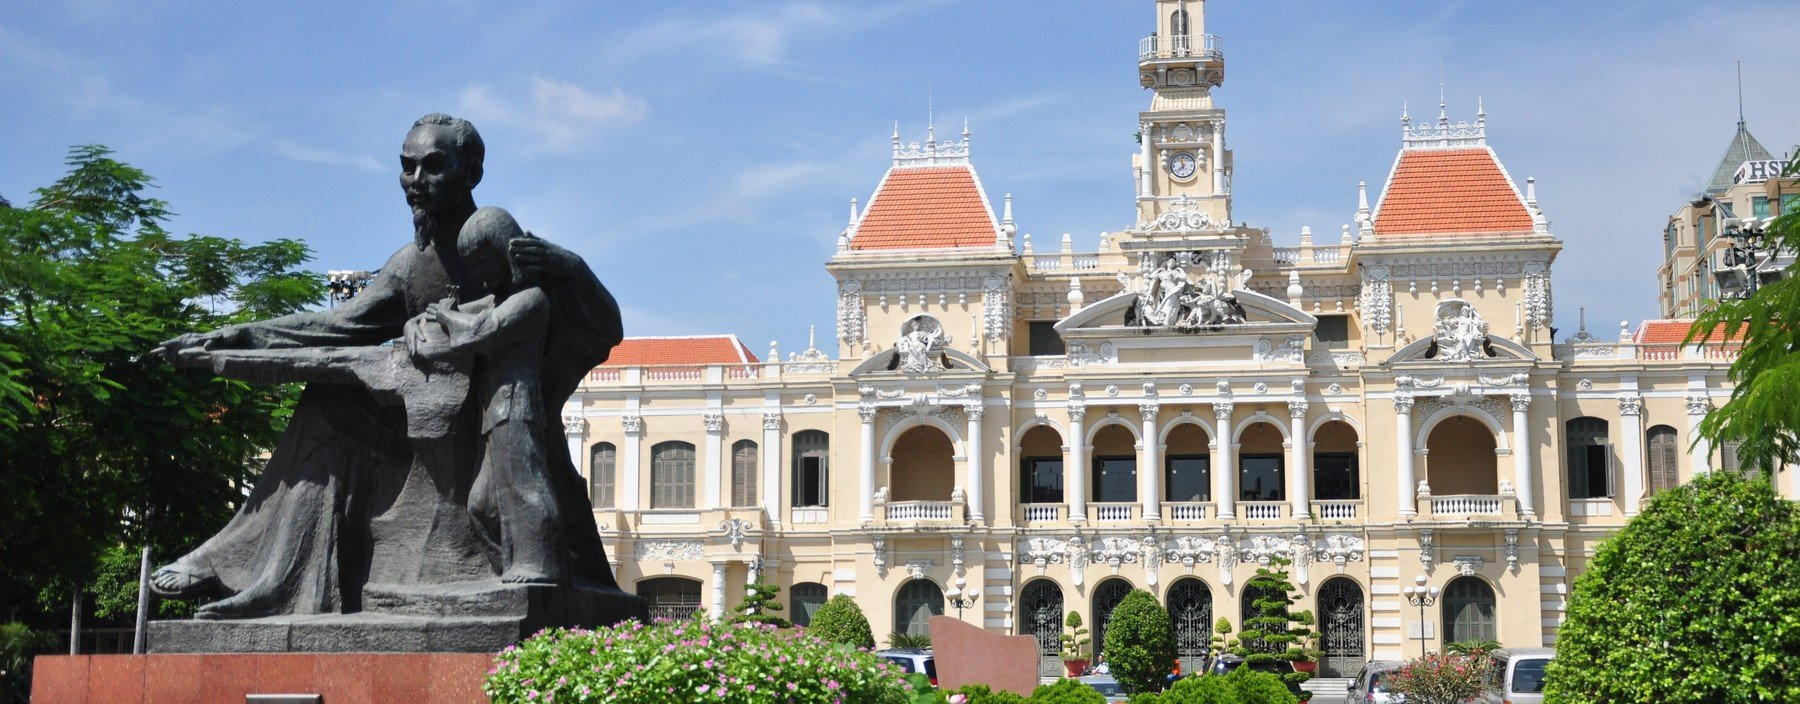 vn, ho chi minh city, city  hall (2).jpg